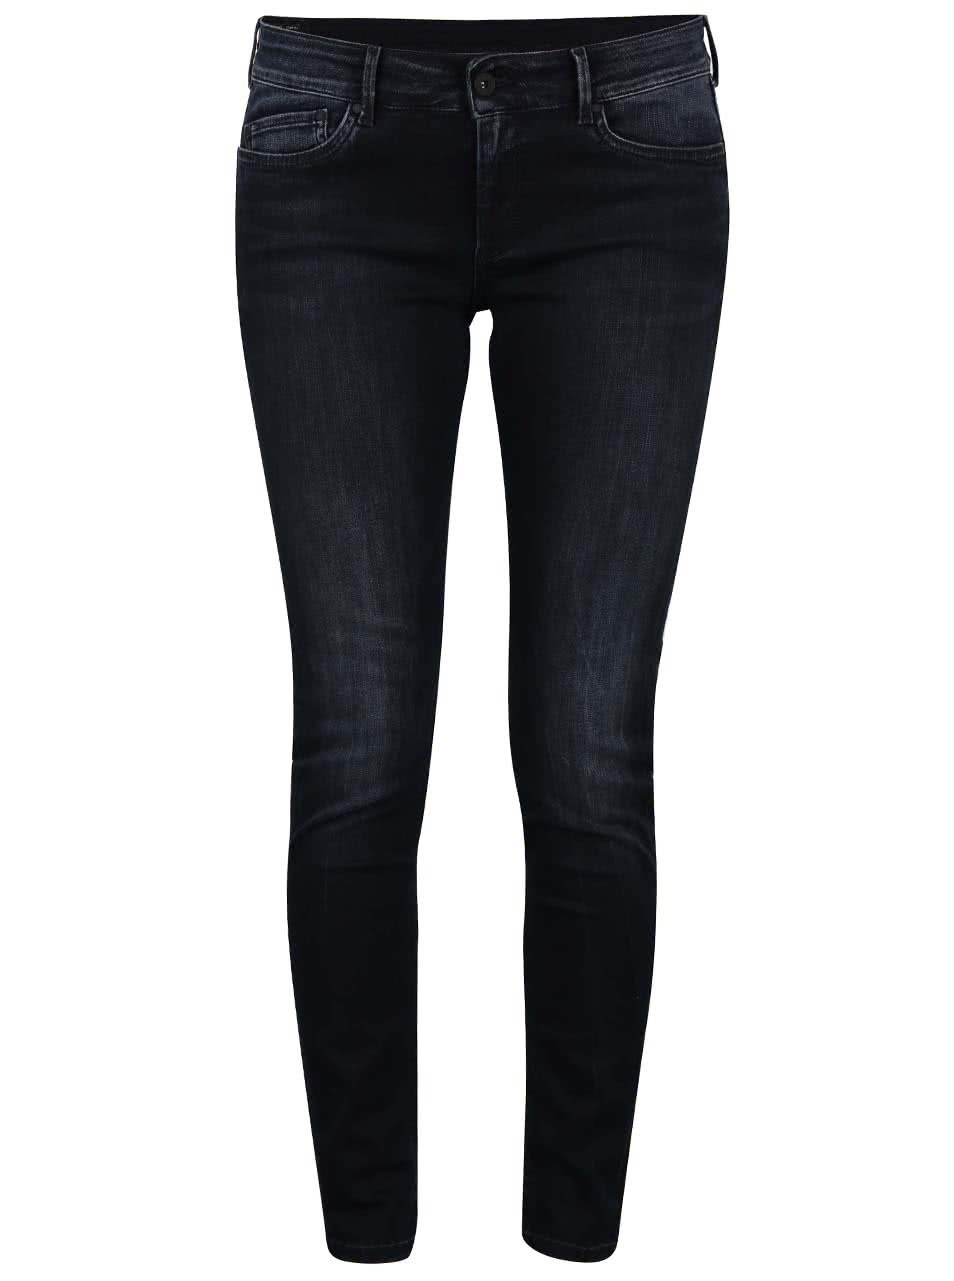 474cfa3dc1c Tmavě modré dámské slim fit džíny Pepe Jeans Pixie ...